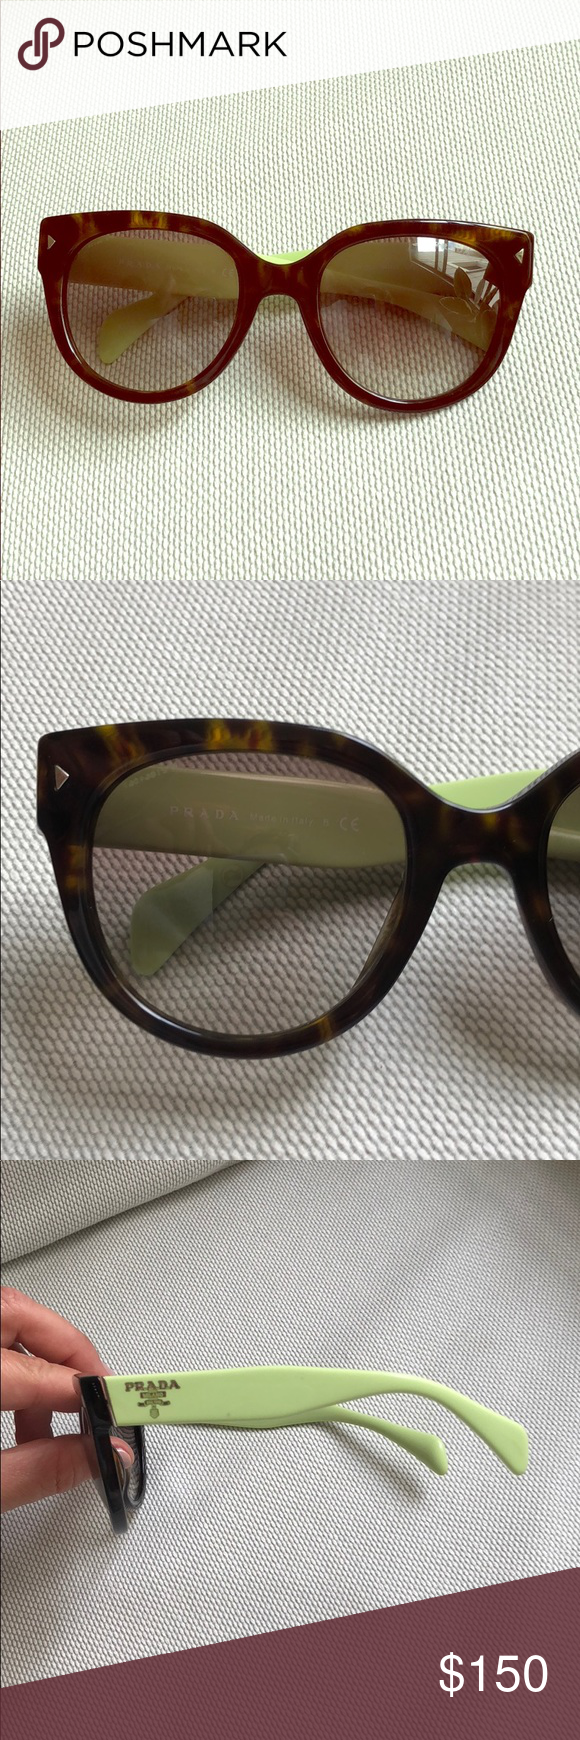 72c63e18462e0 Prada SPR 170 cat eye sunglasses Only worn a few times